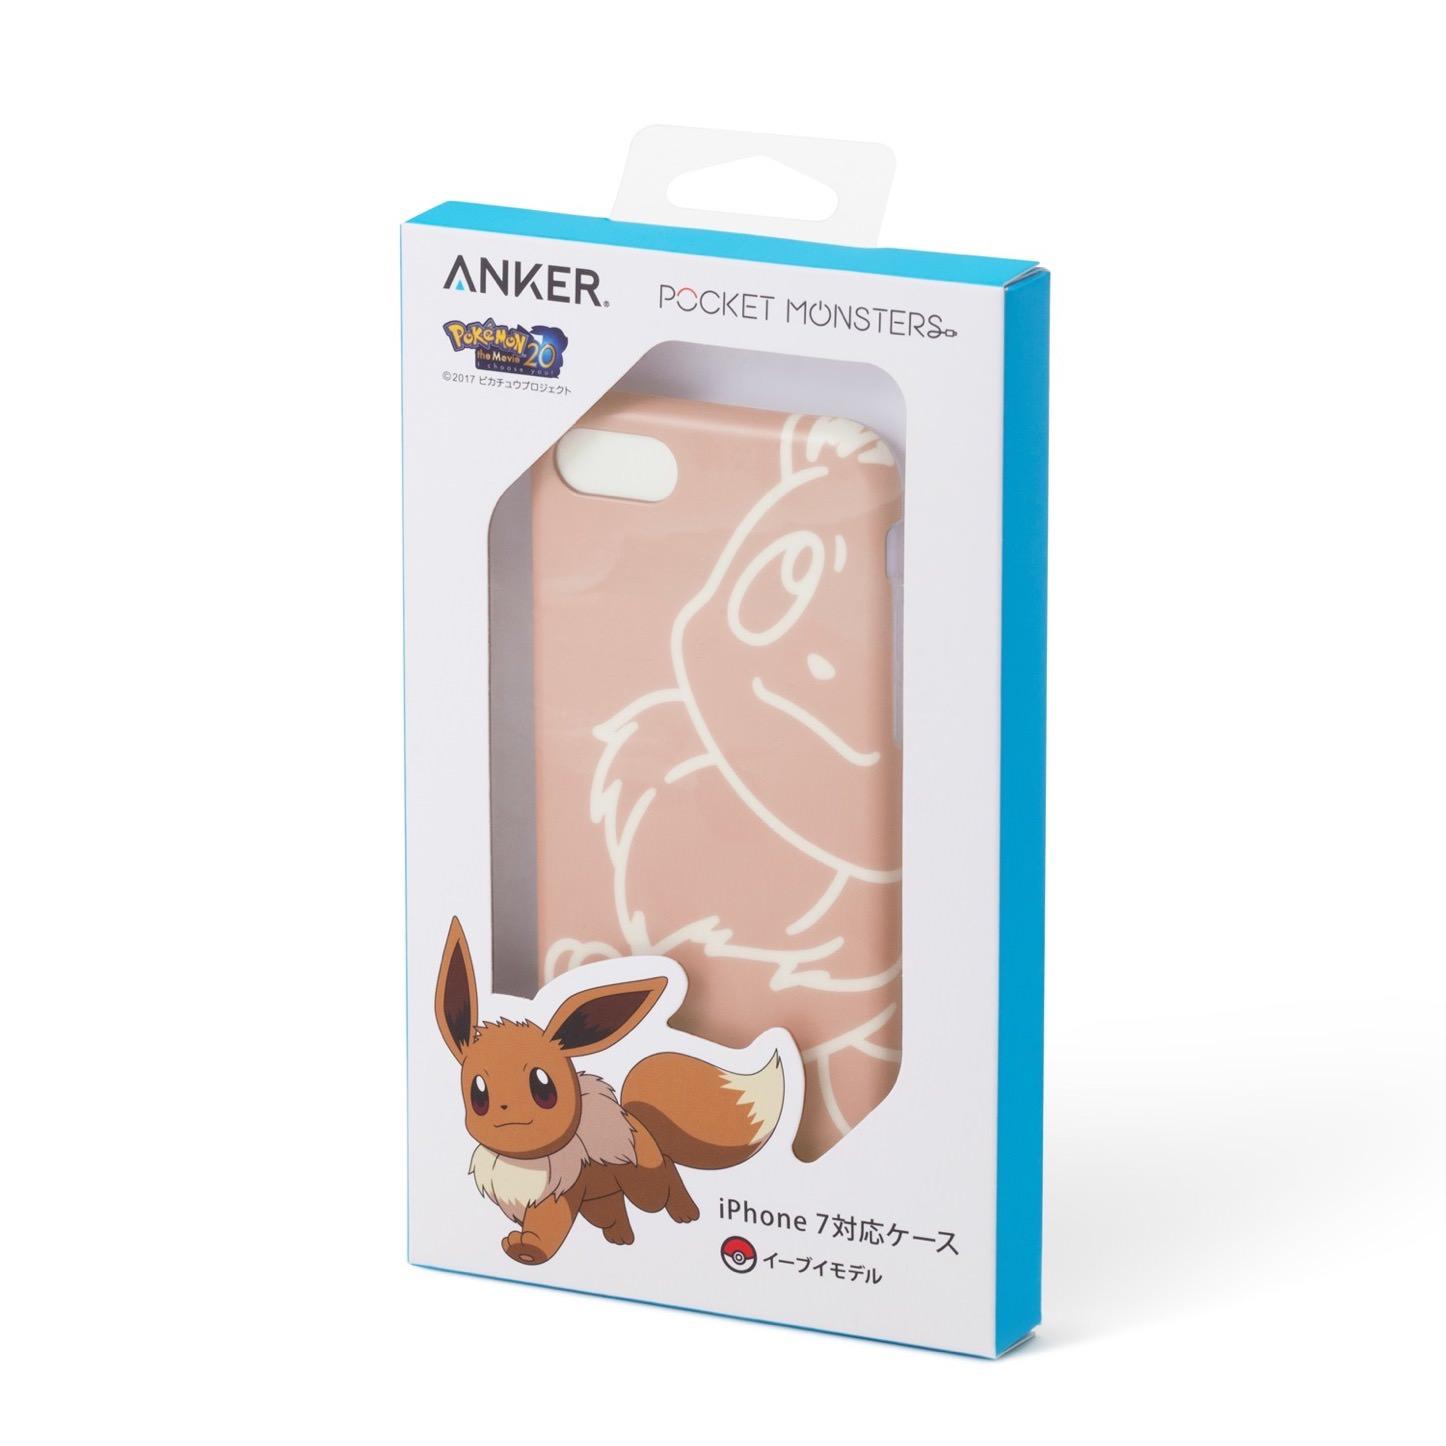 Anker-Pokemon-Mobile-Accessories-14.jpg